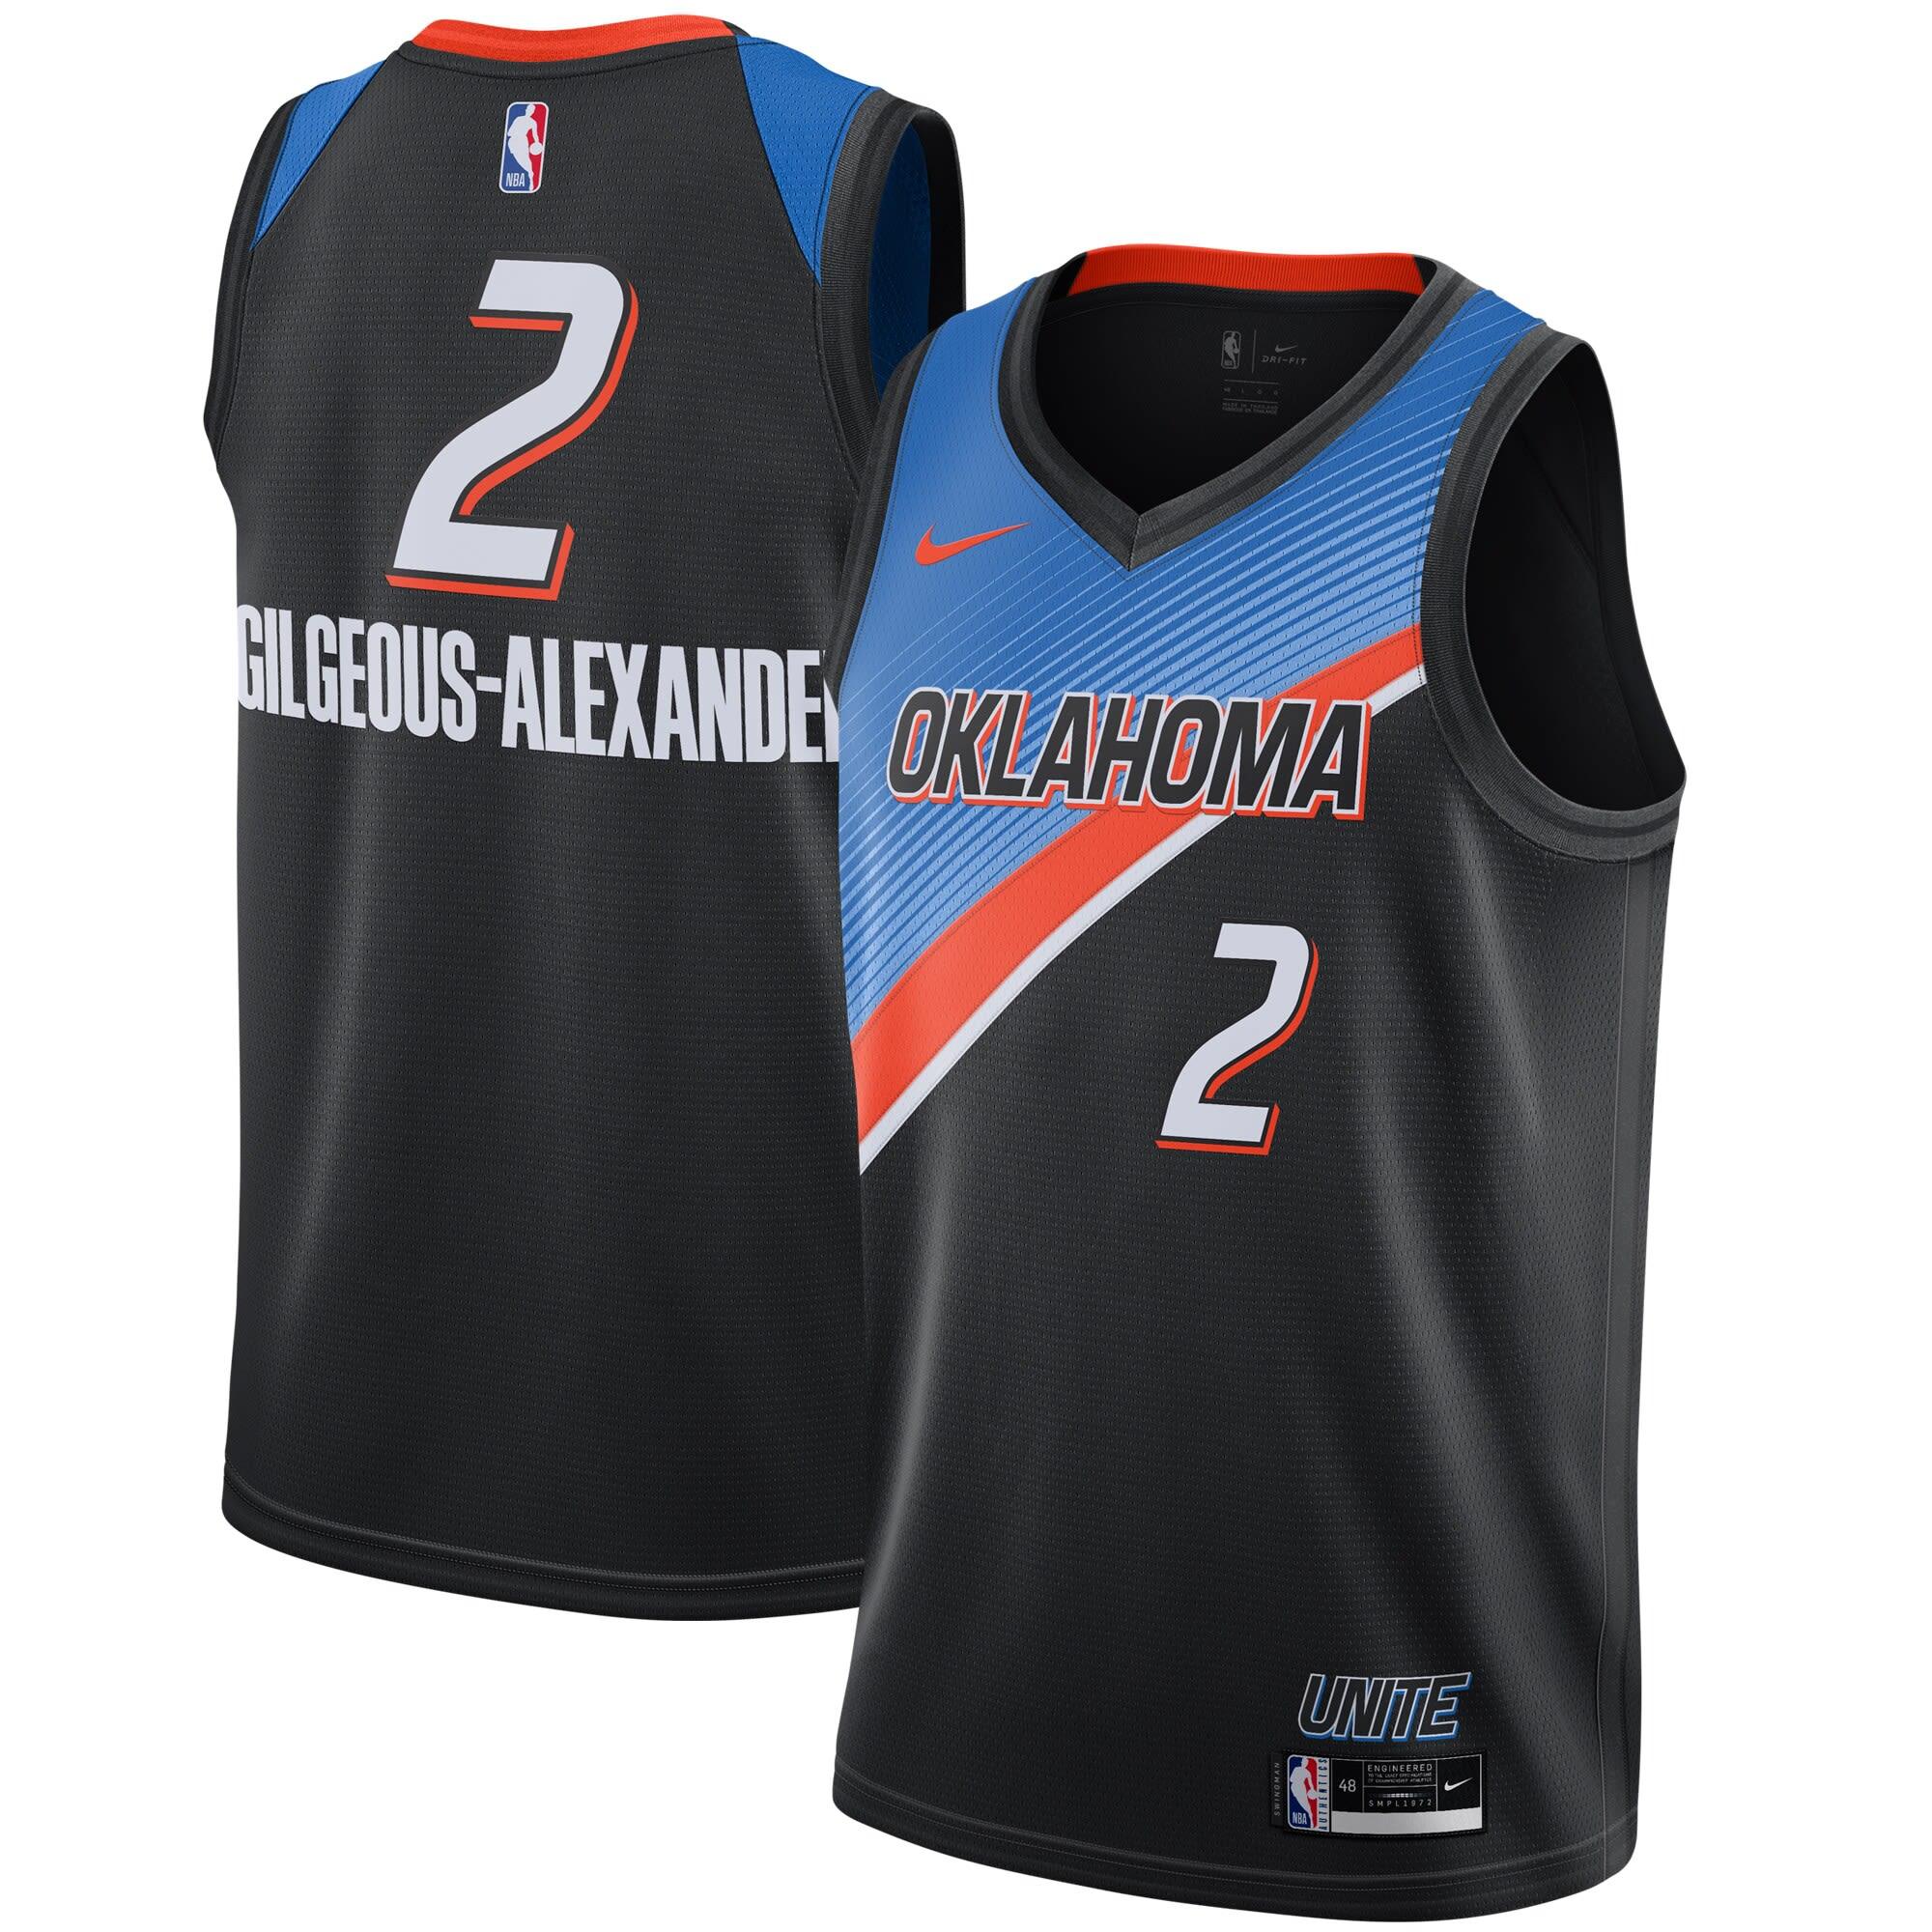 Oklahoma City Thunder City Edition gear